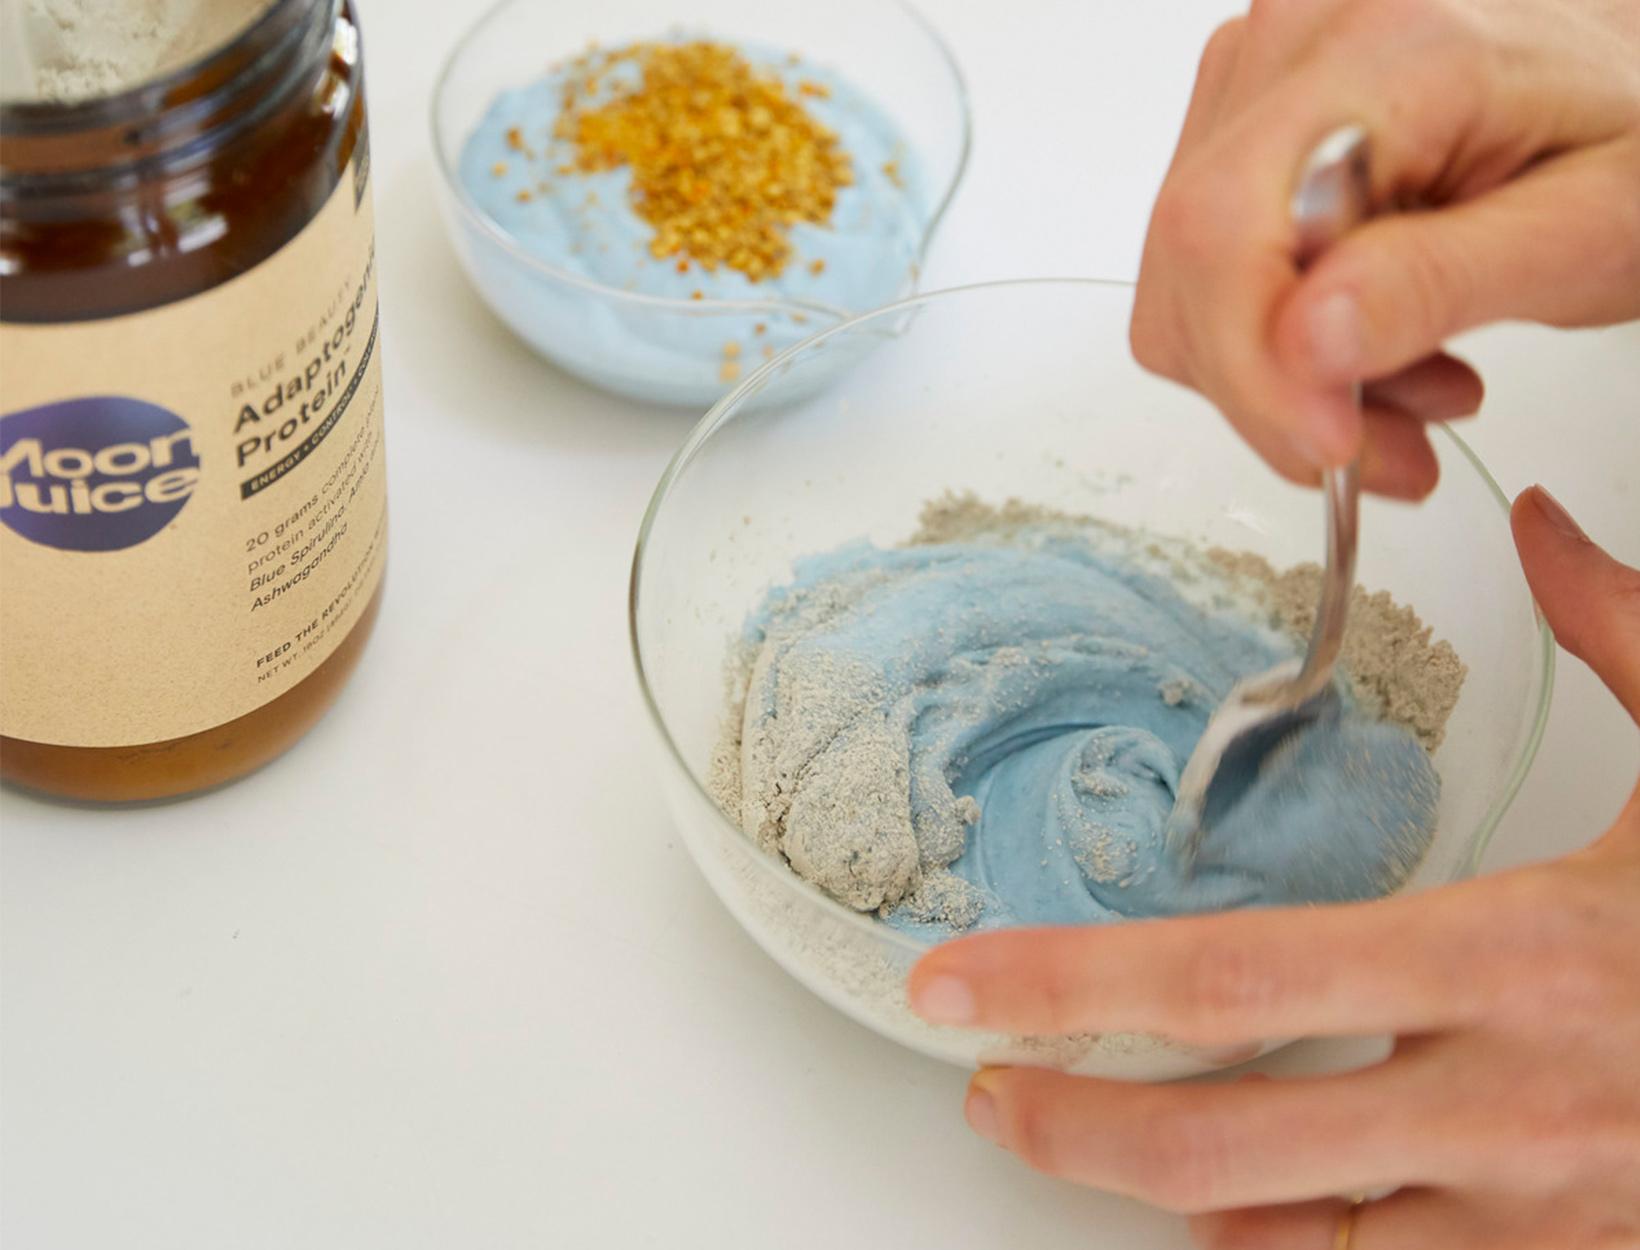 Blue Beauty Yogurt Bowl